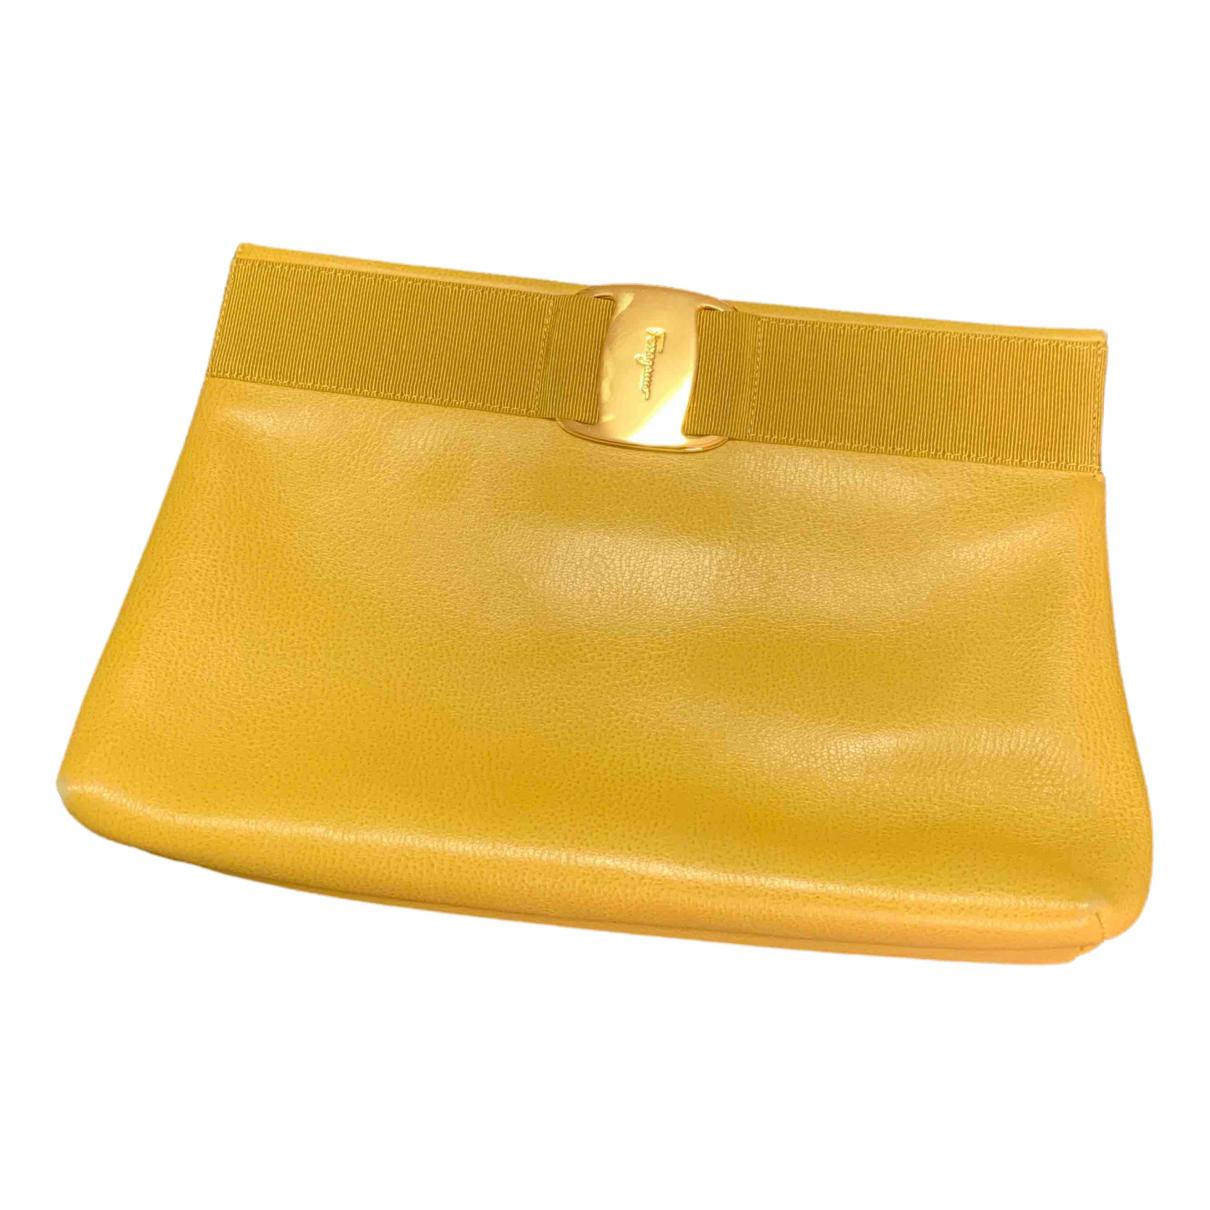 Salvatore Ferragamo \N Clutch in  Gelb Lackleder